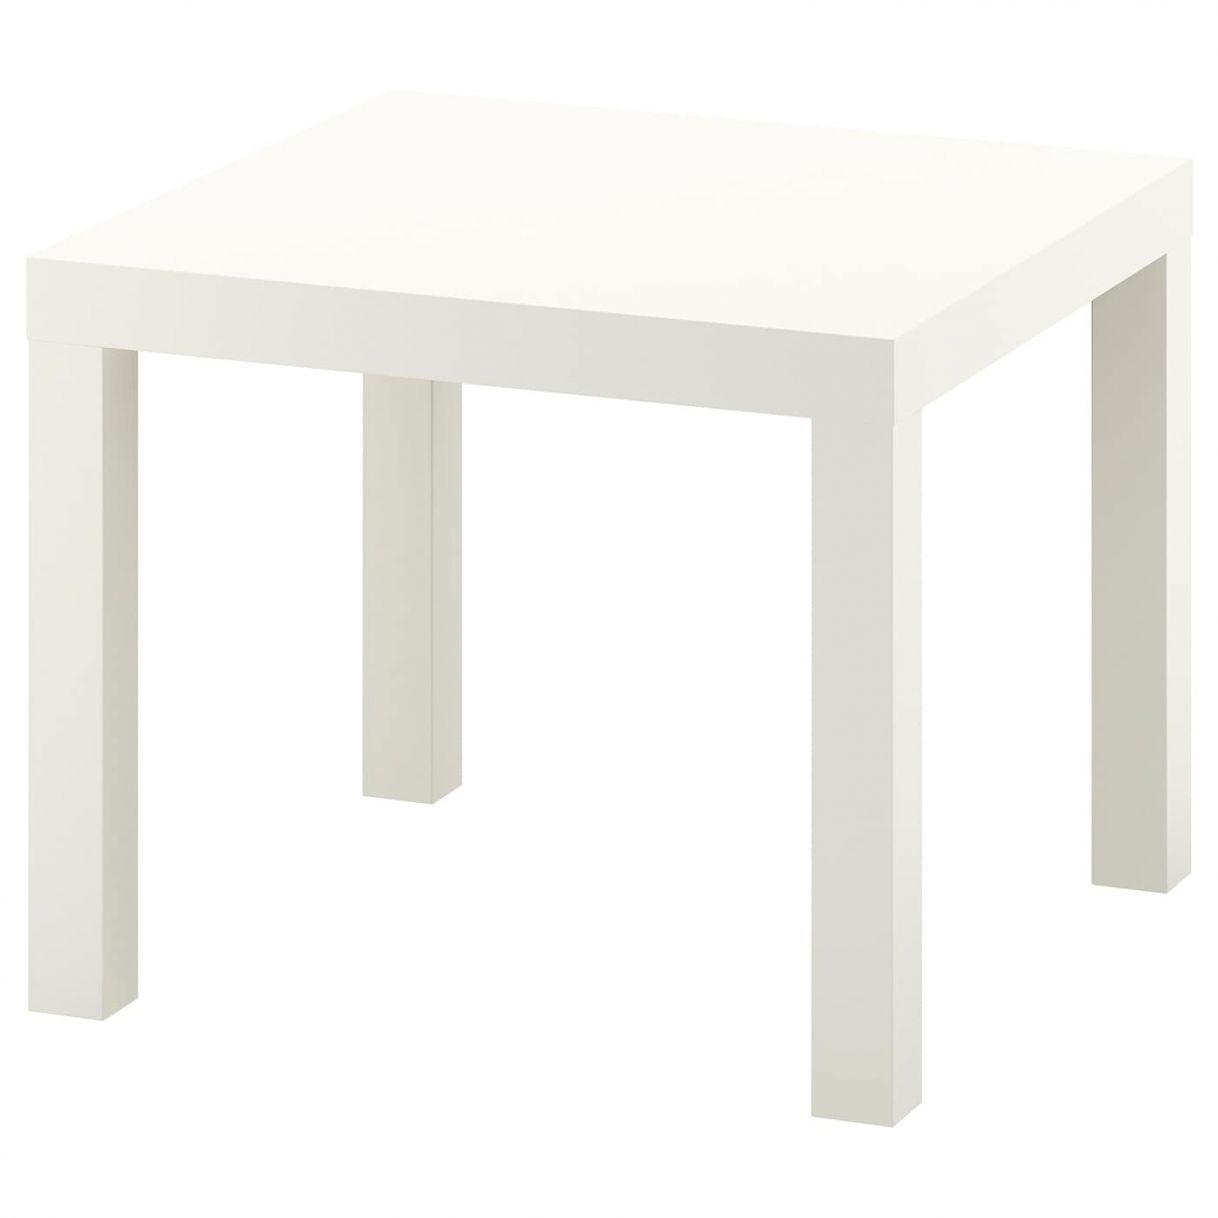 Trends Ikea Lack Table Plan Design Table Ideas Mebel [ 1218 x 1218 Pixel ]